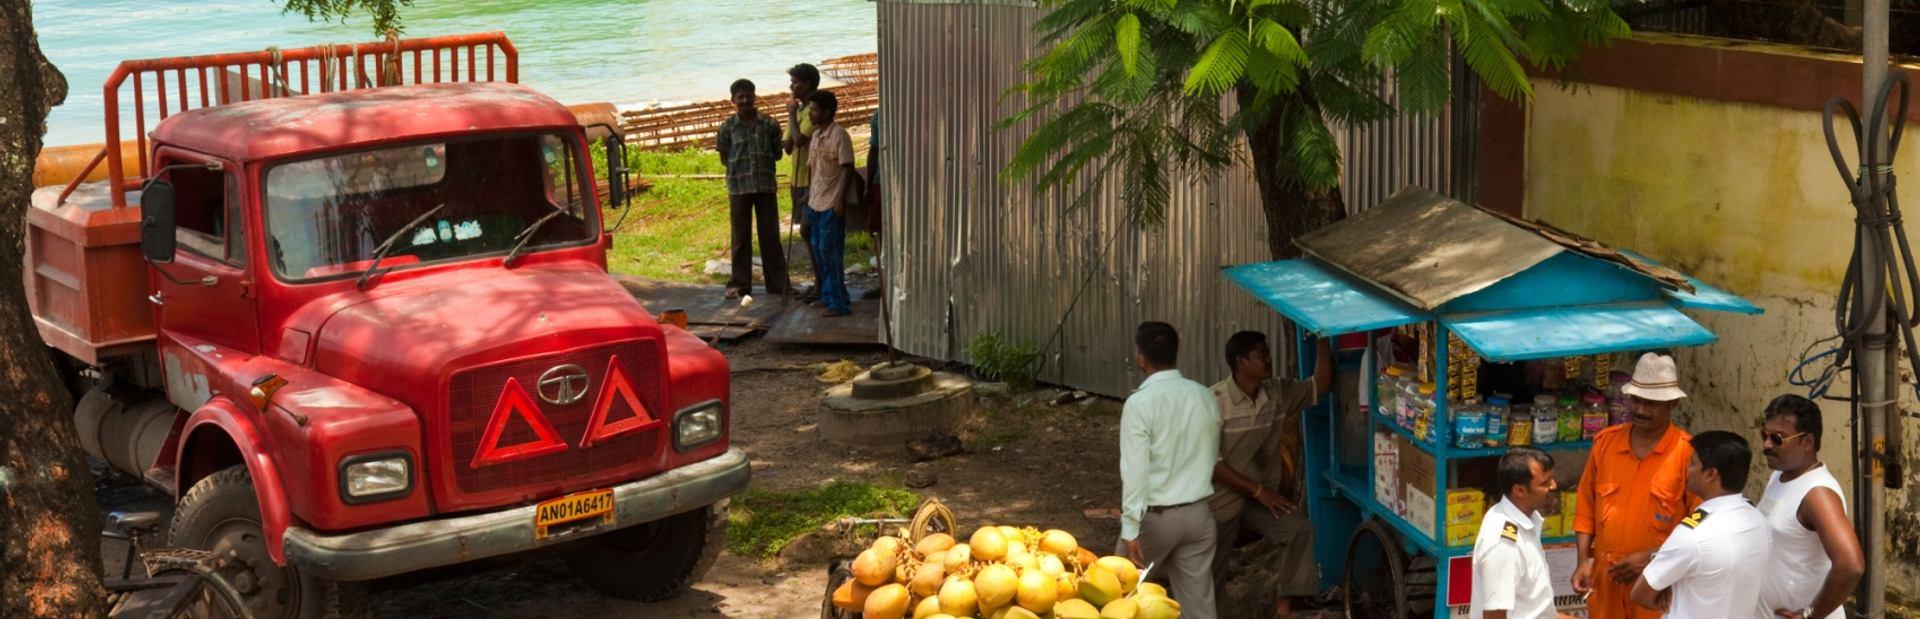 Andaman Islands climate photo